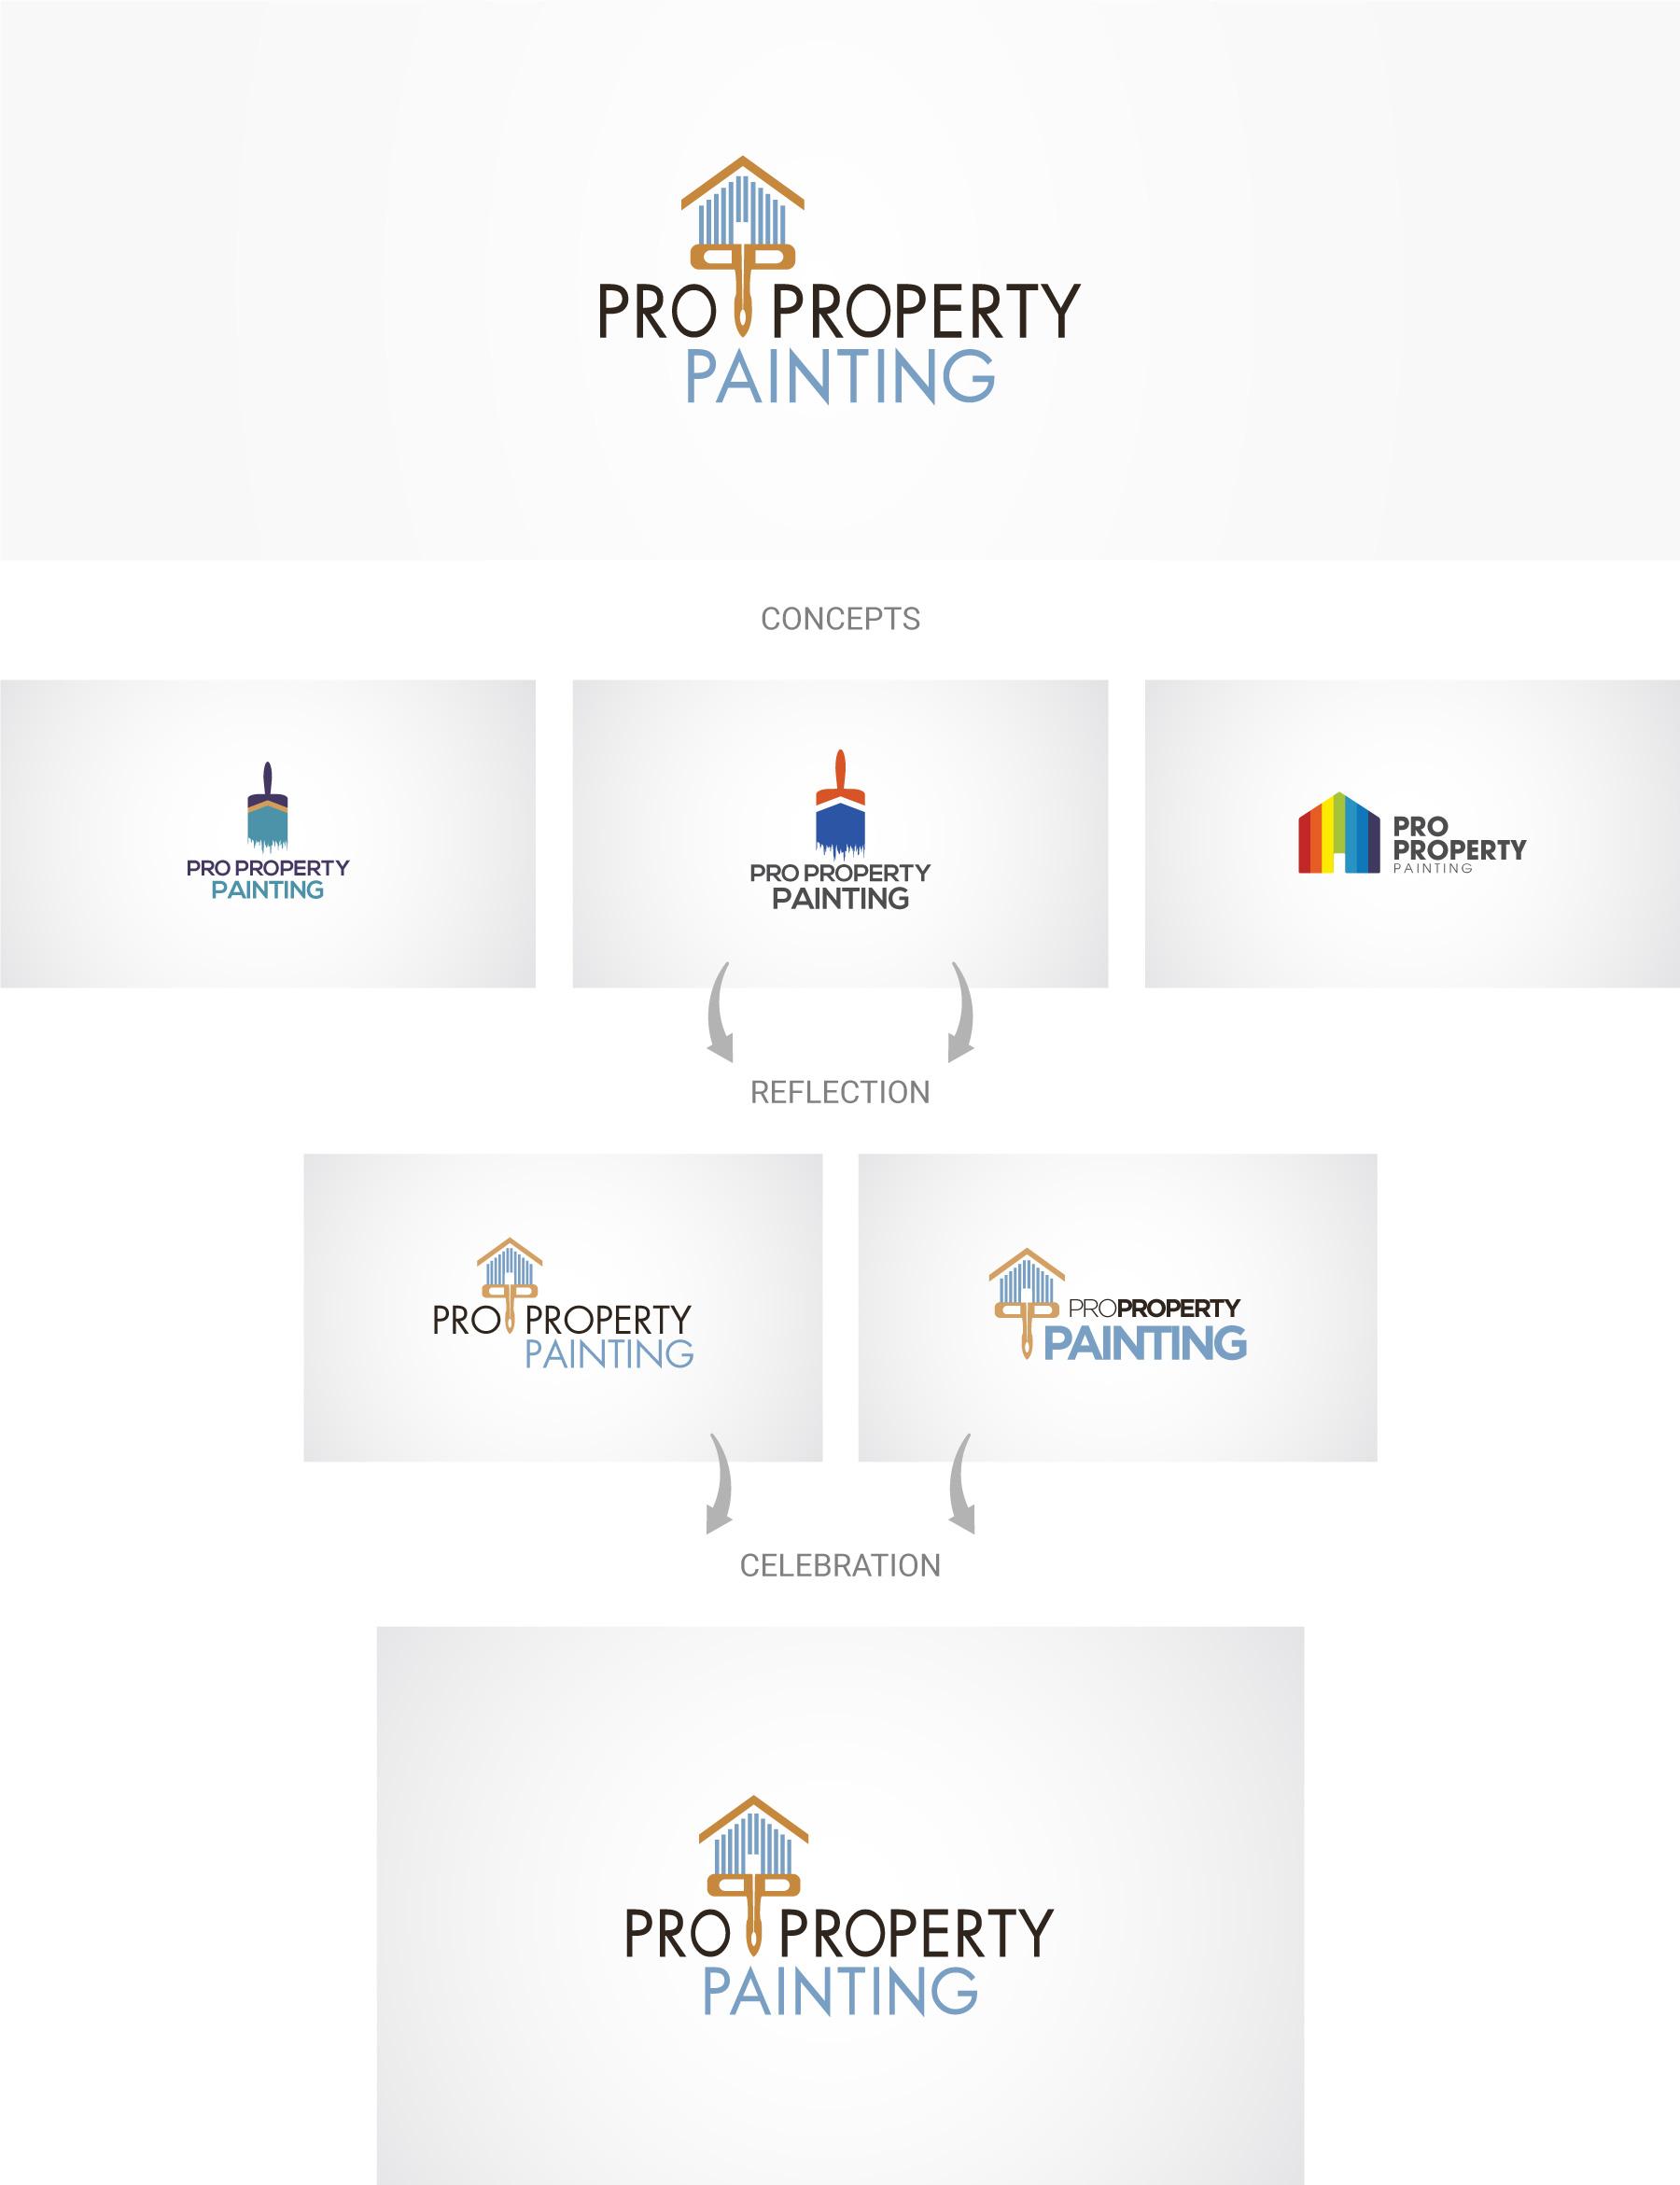 Pro-property-painting-logo-design